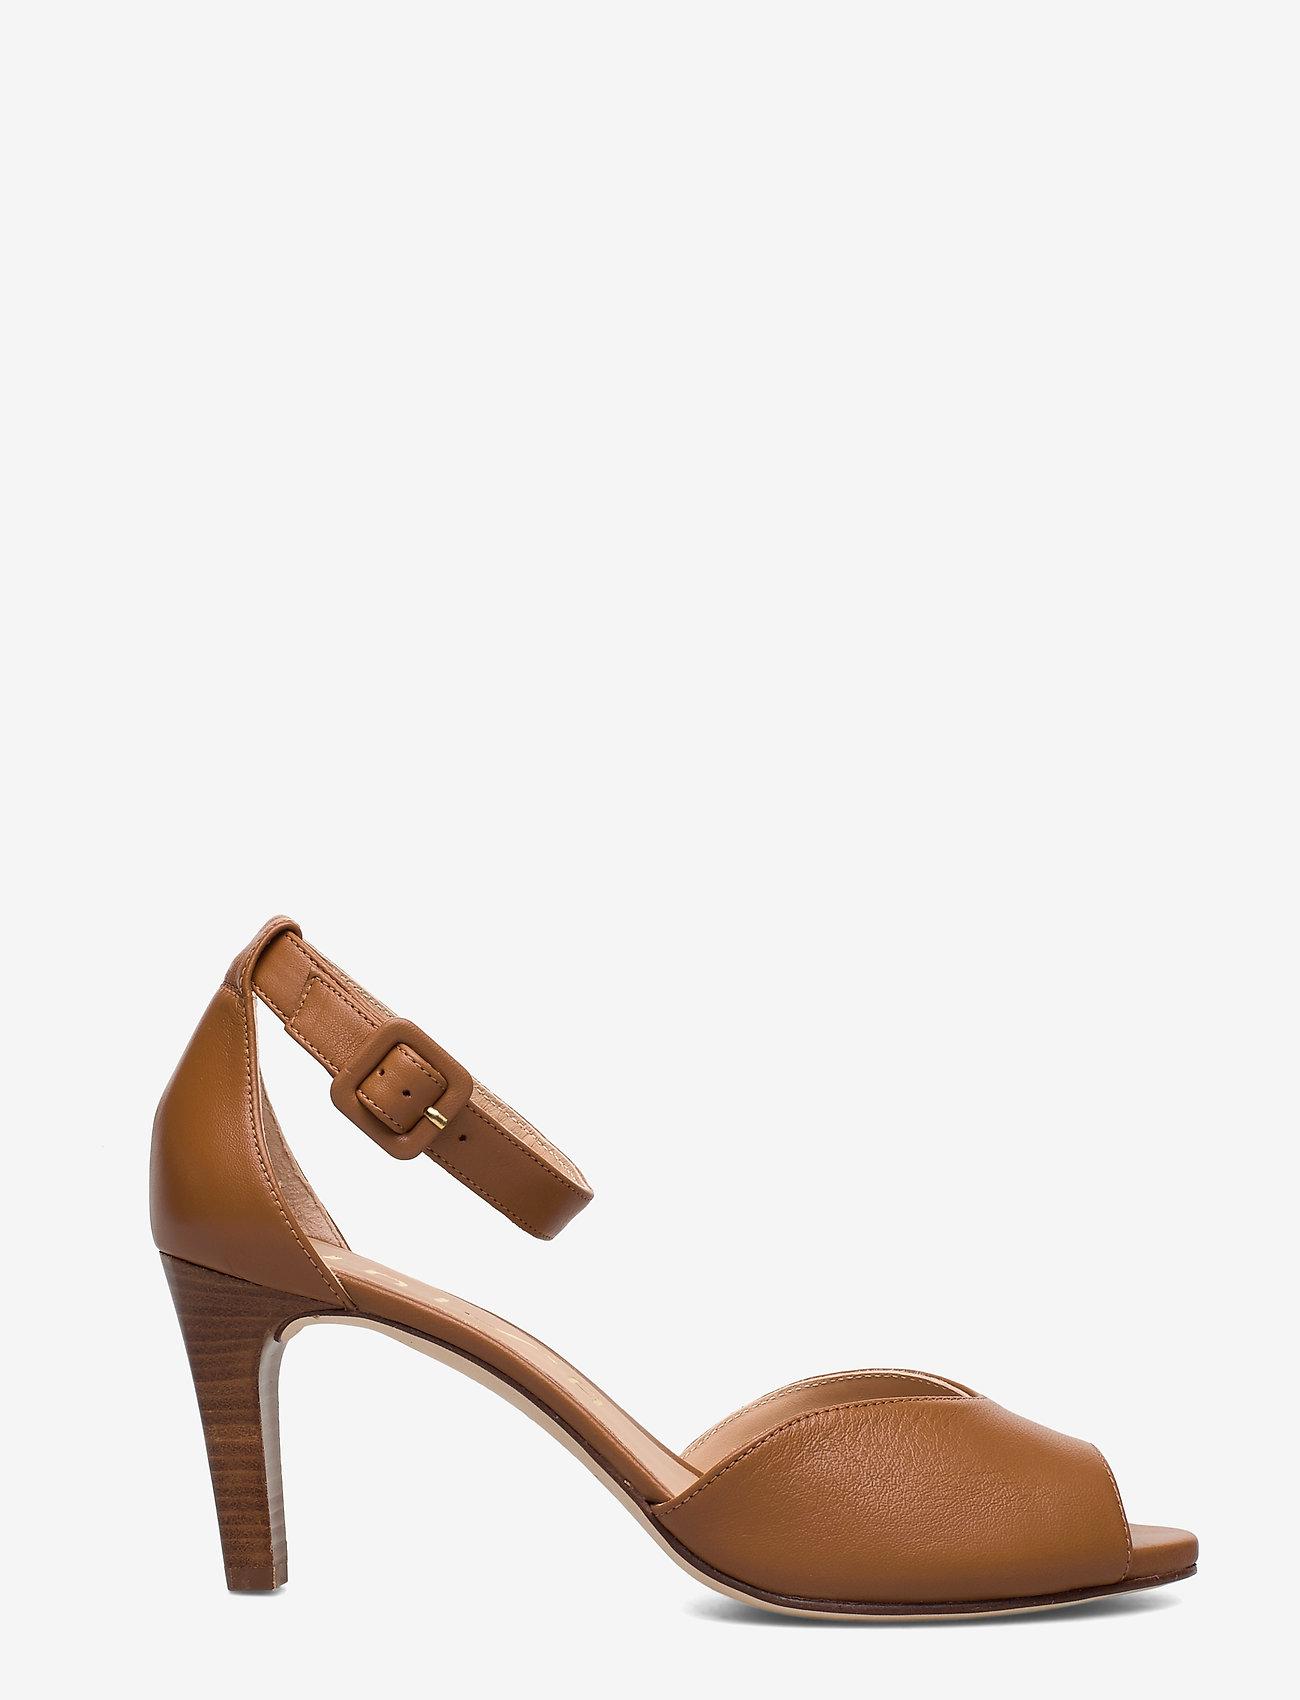 UNISA - LOFT_NA - szpilki peep toe - bisquit - 1